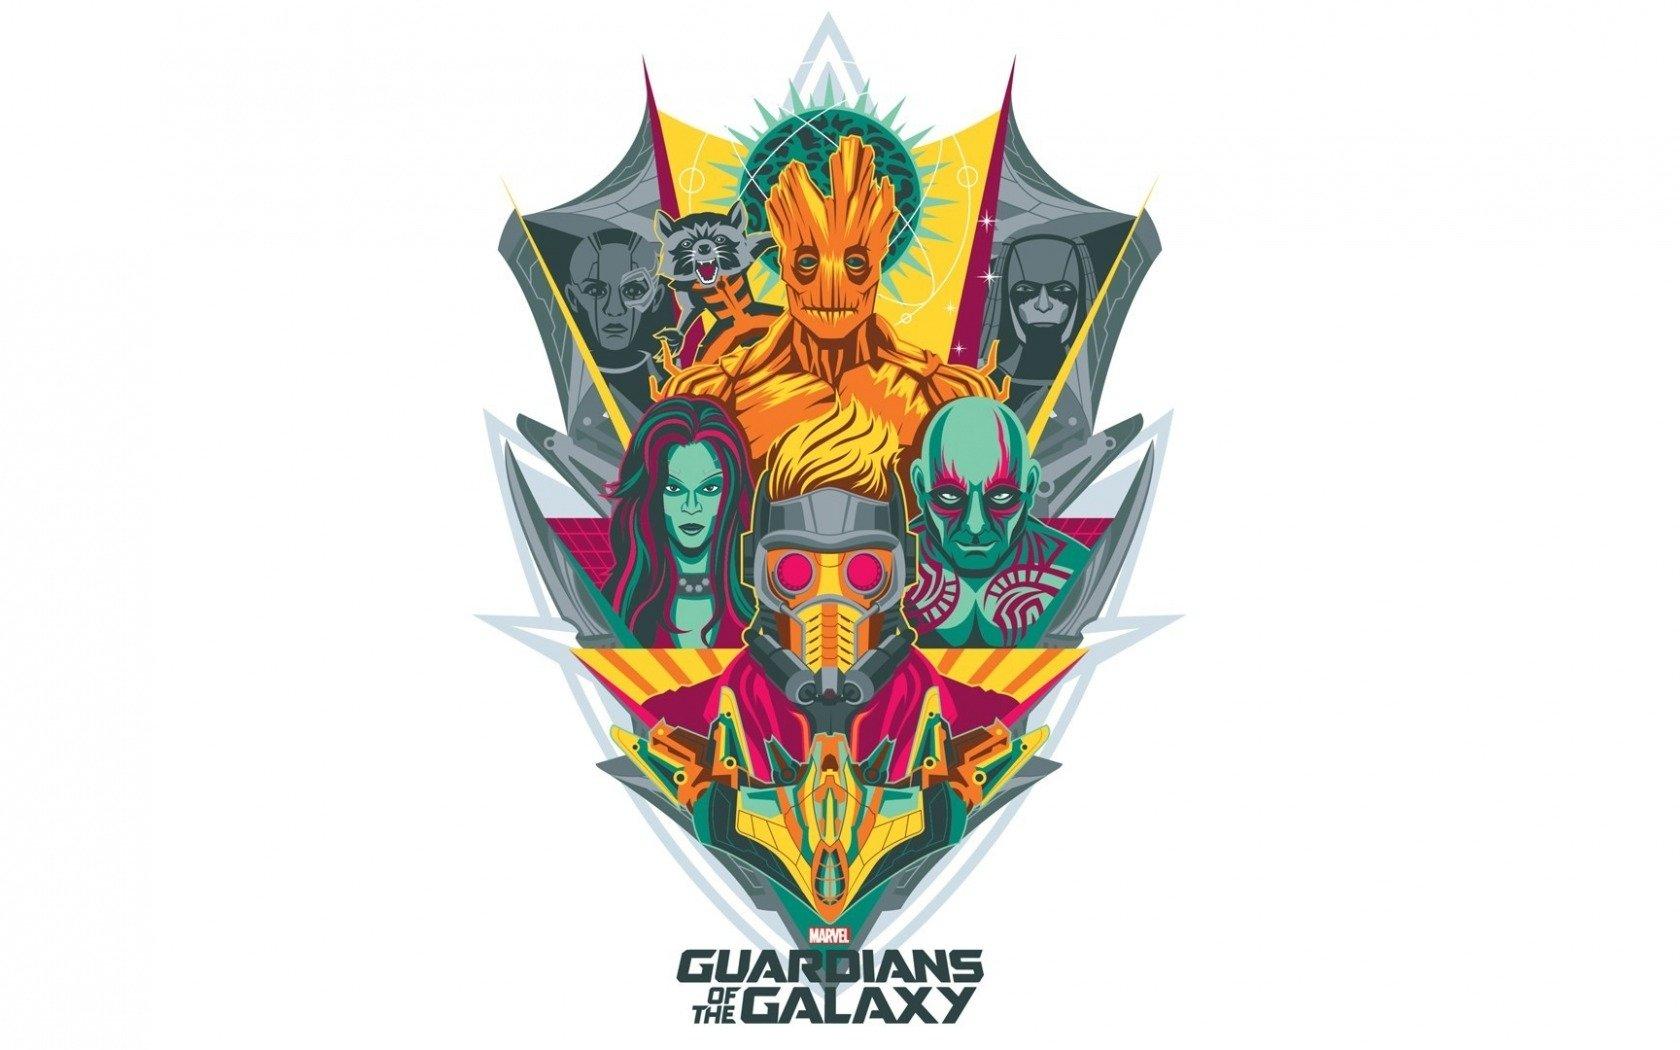 Comics - Guardians Of The Galaxy  Drax The Destroyer Comic Rocket Raccoon Groot Comics Galaxy Marvel Comics Rocket Star Lord Gamora Wallpaper